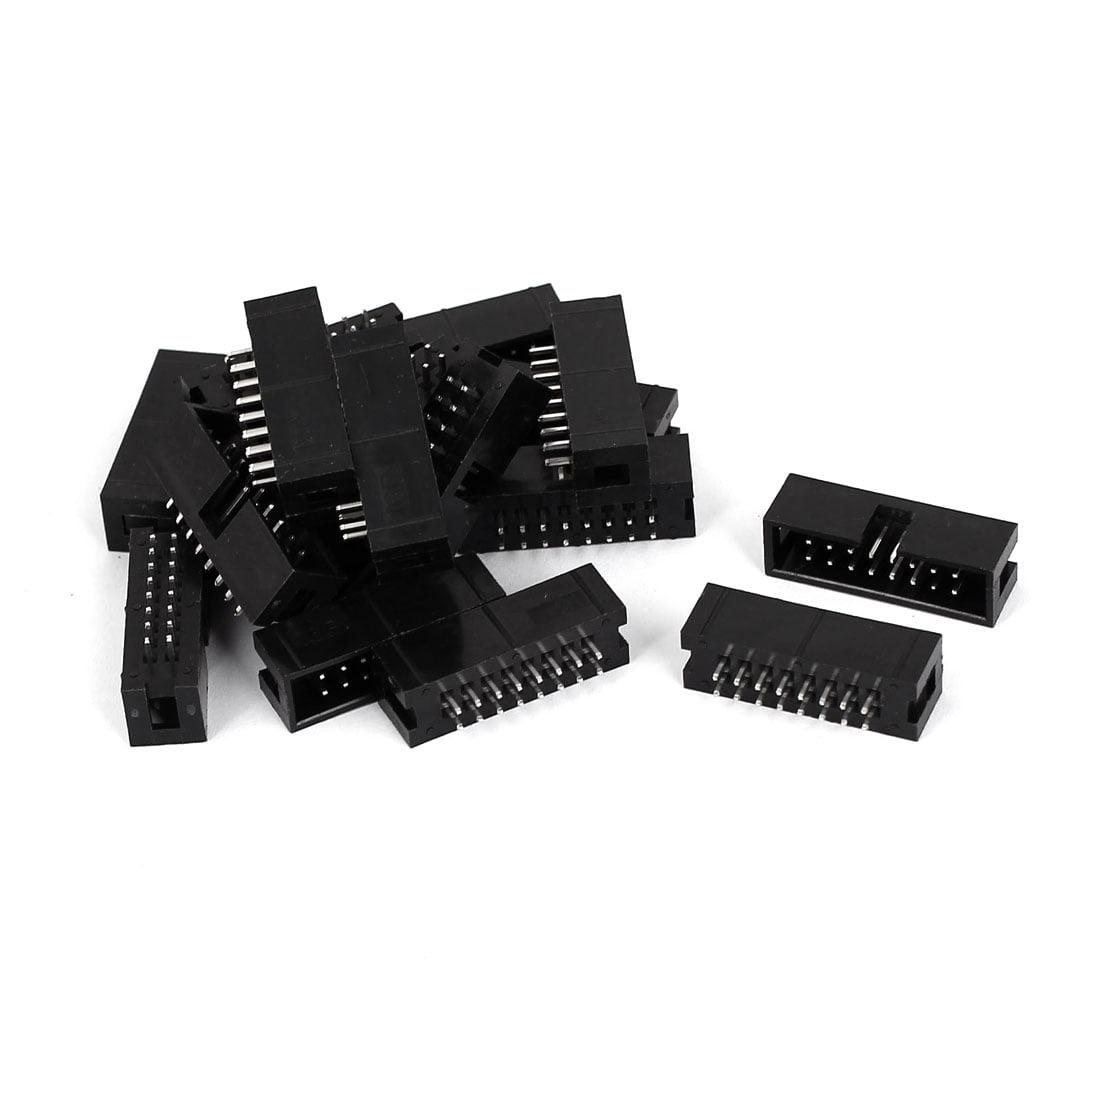 18pcs 2.54mm Pitch 2x8 16-Pin Box Header IDC Socket Straight Male Connector